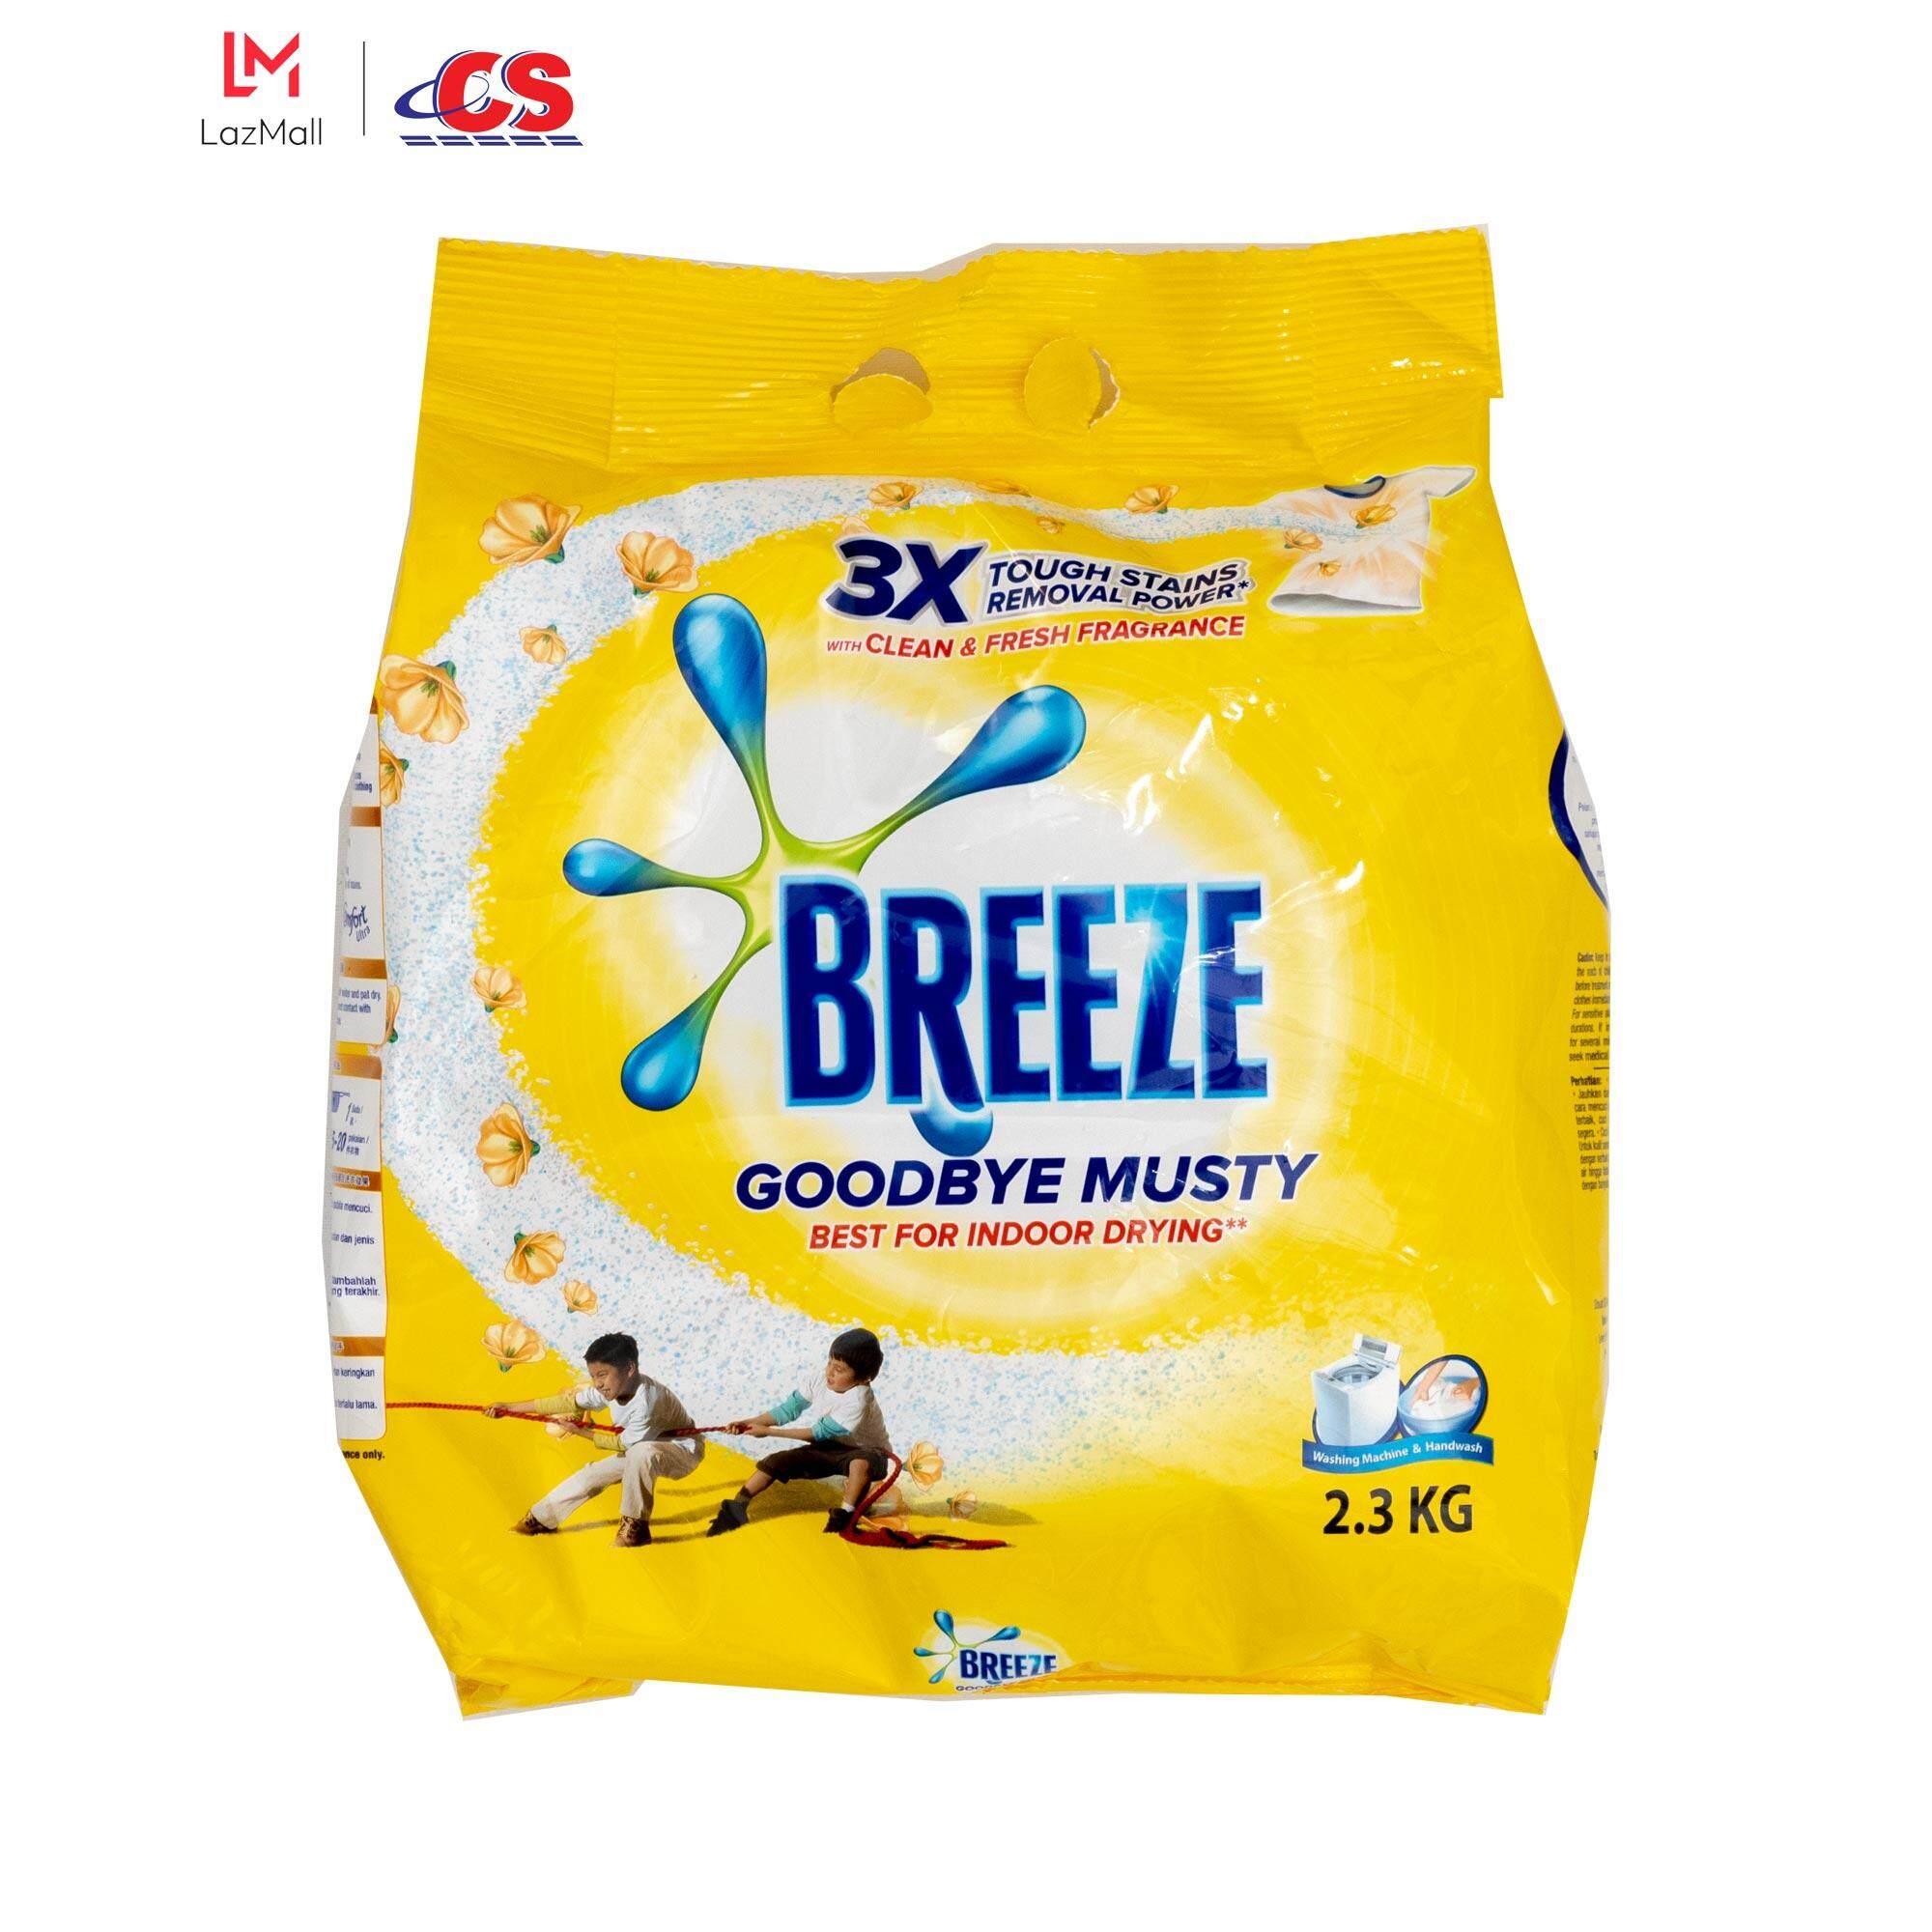 BREEZE Powder Goodbye Musty (Yellow) 2.3kg